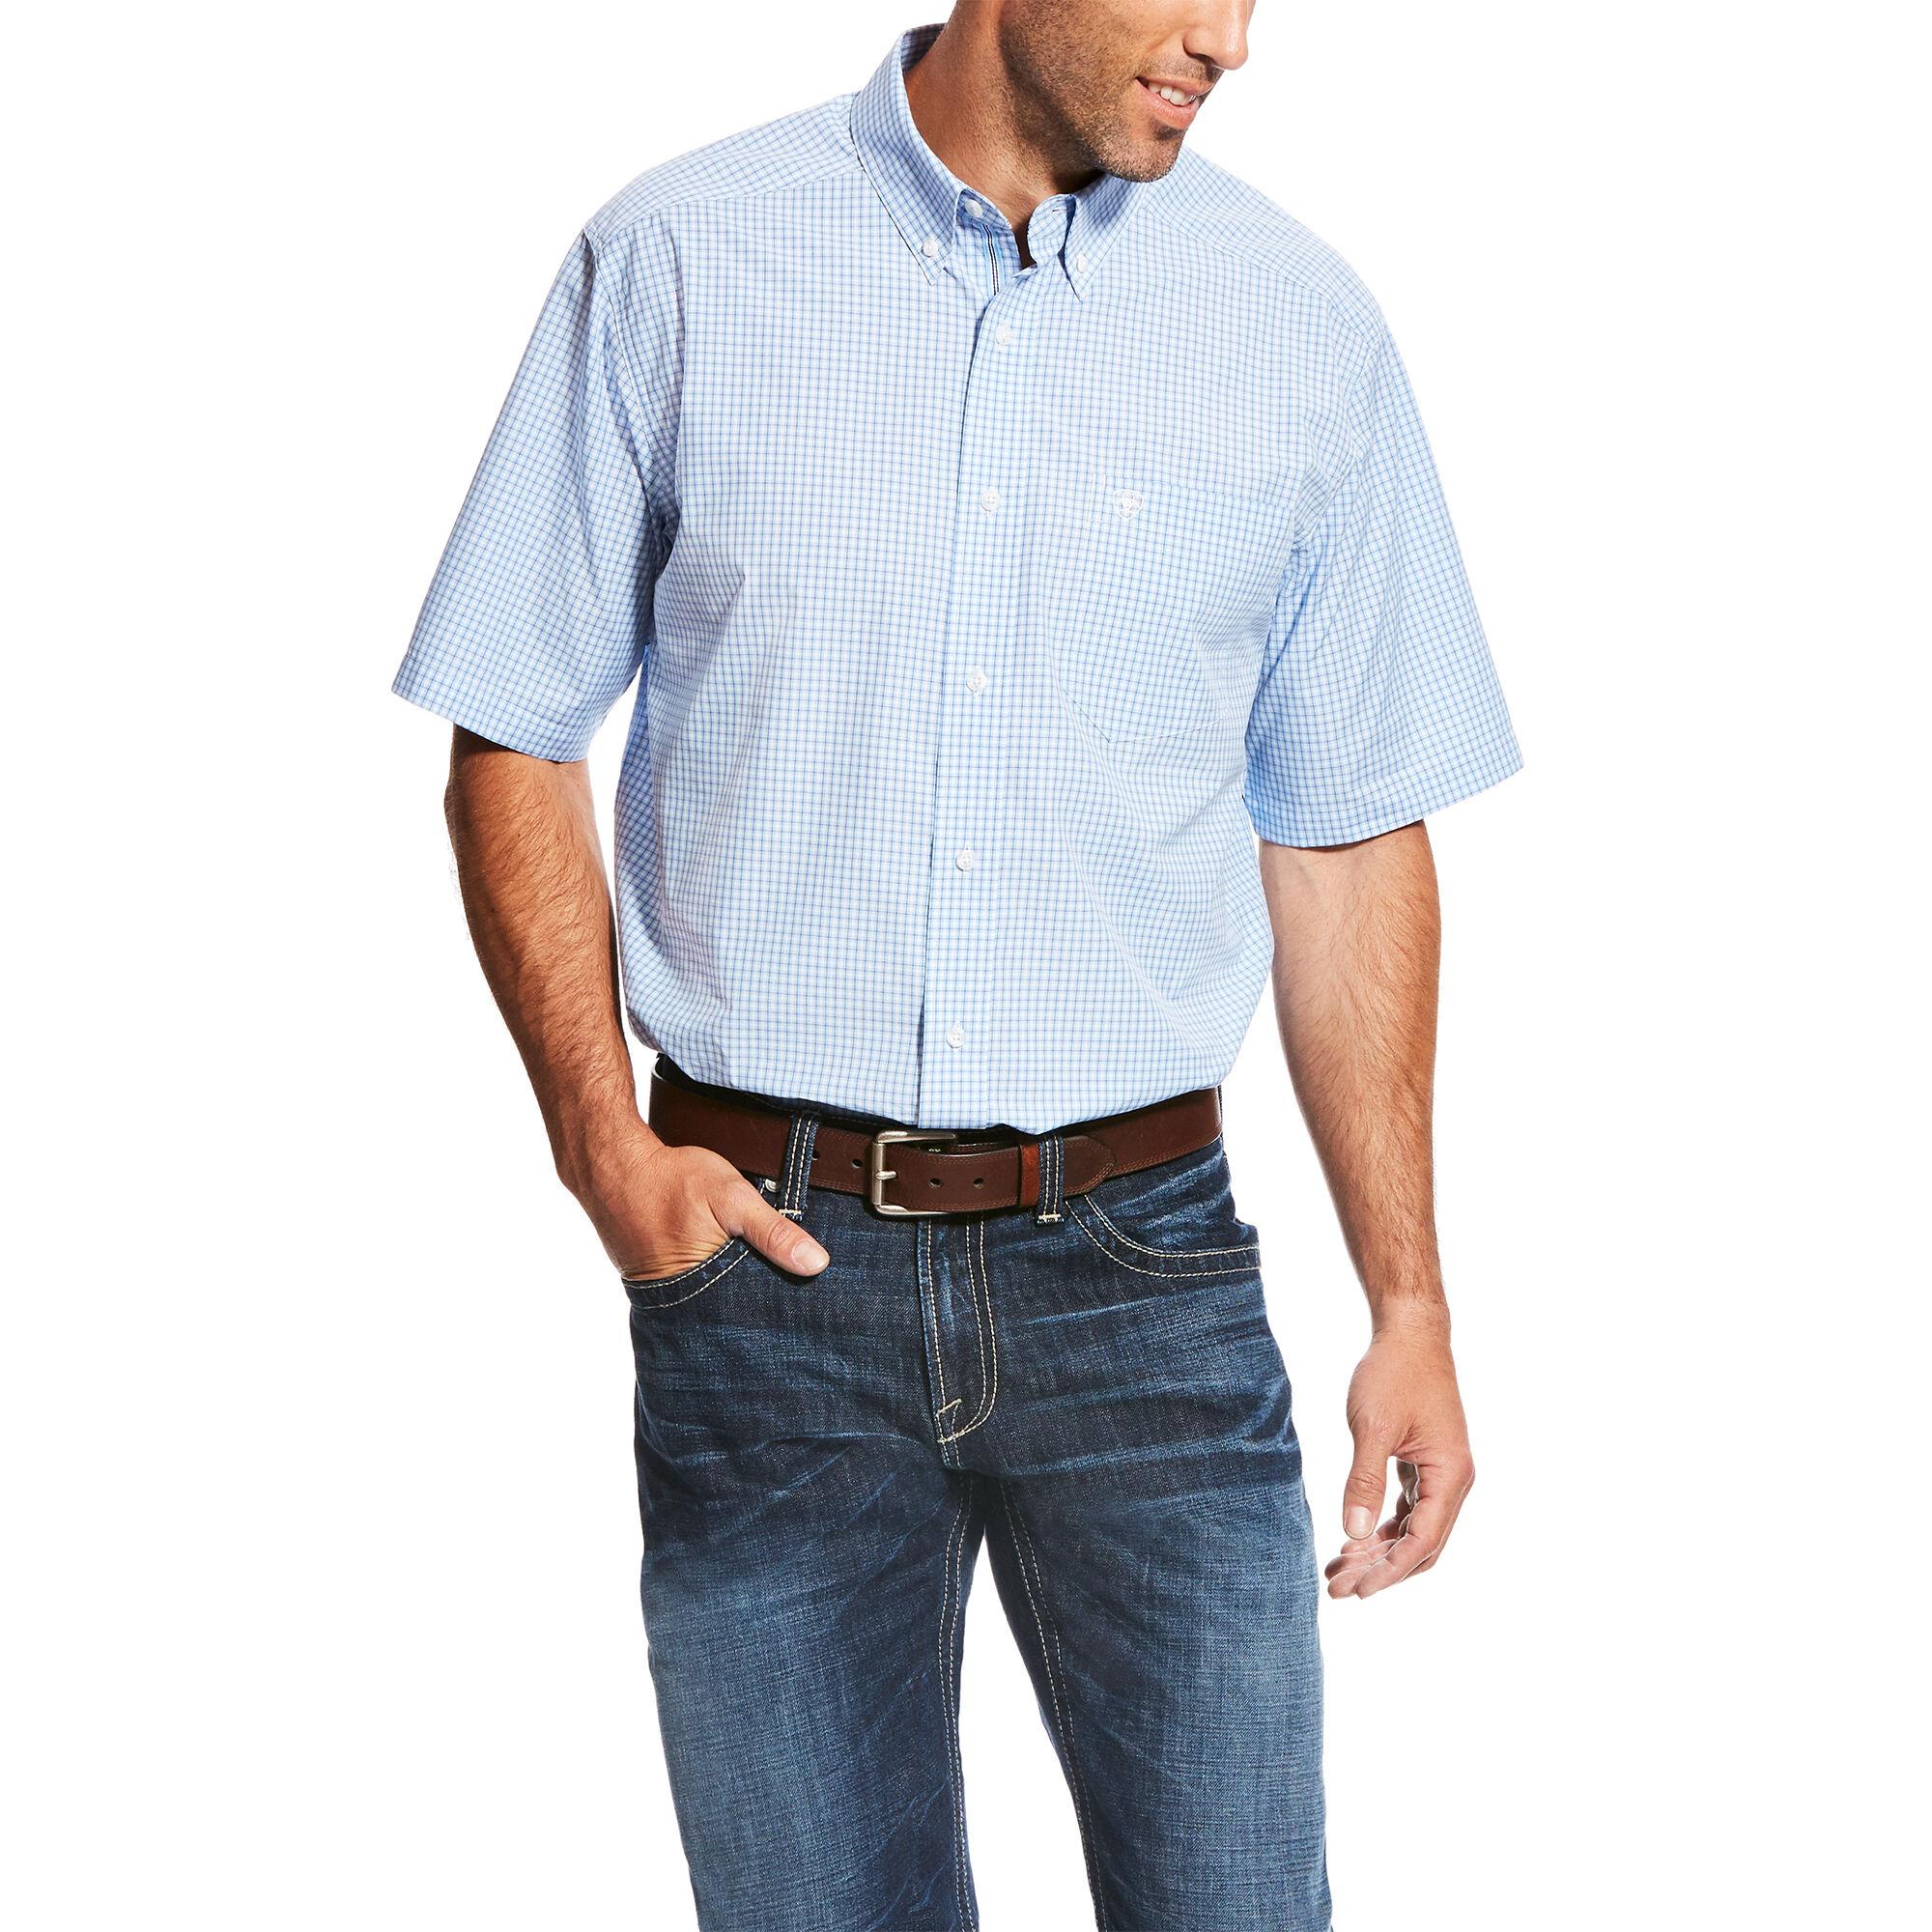 Pro Series Marrow Shirt